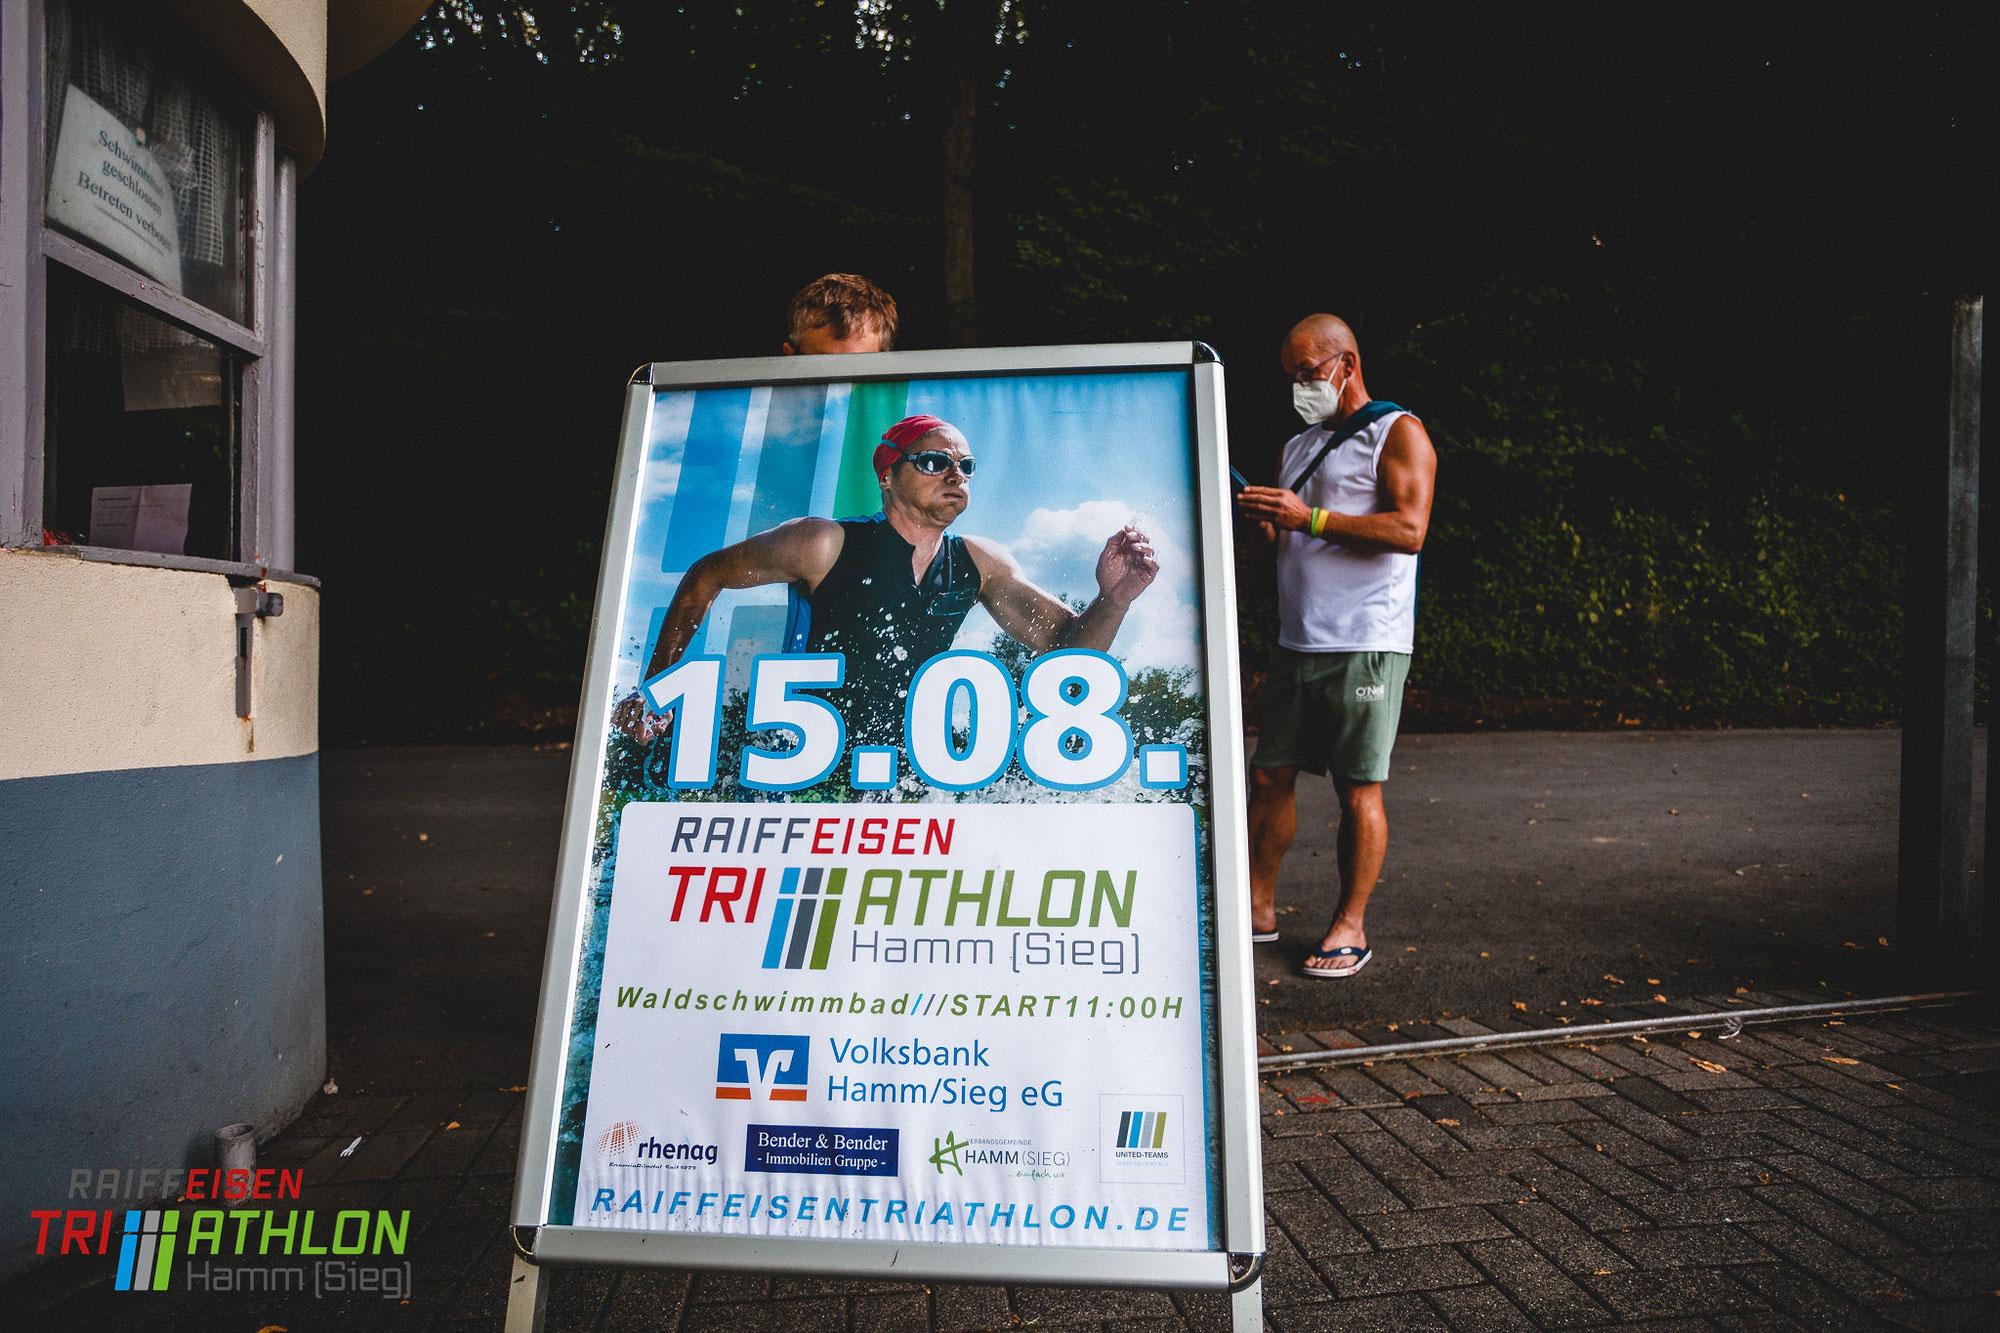 Raiffeisentriathlon Hamm(Sieg)